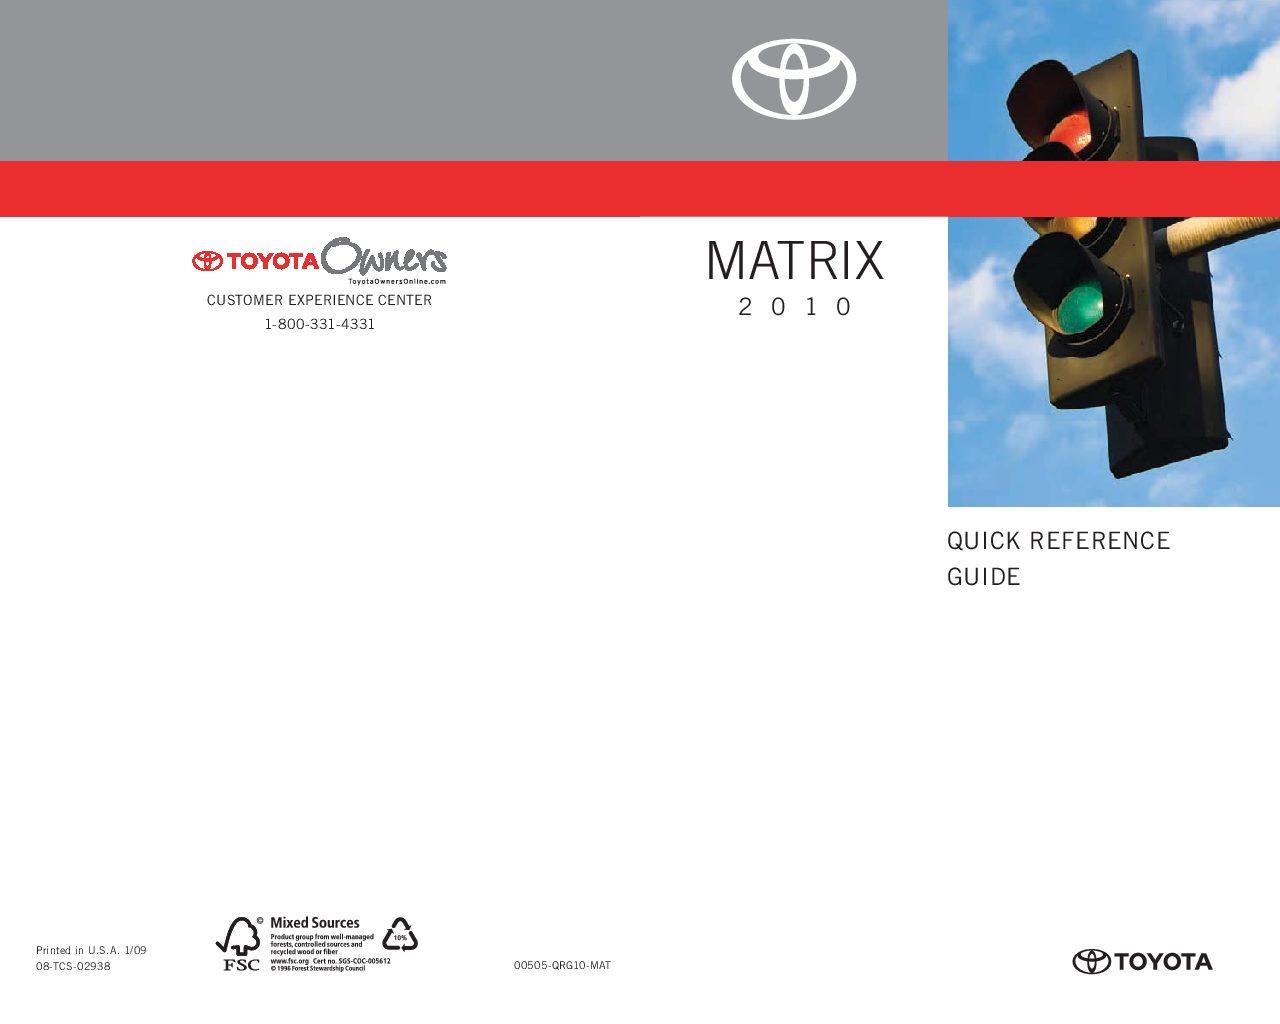 2010 Toyota Matrix Owner's Manual Image